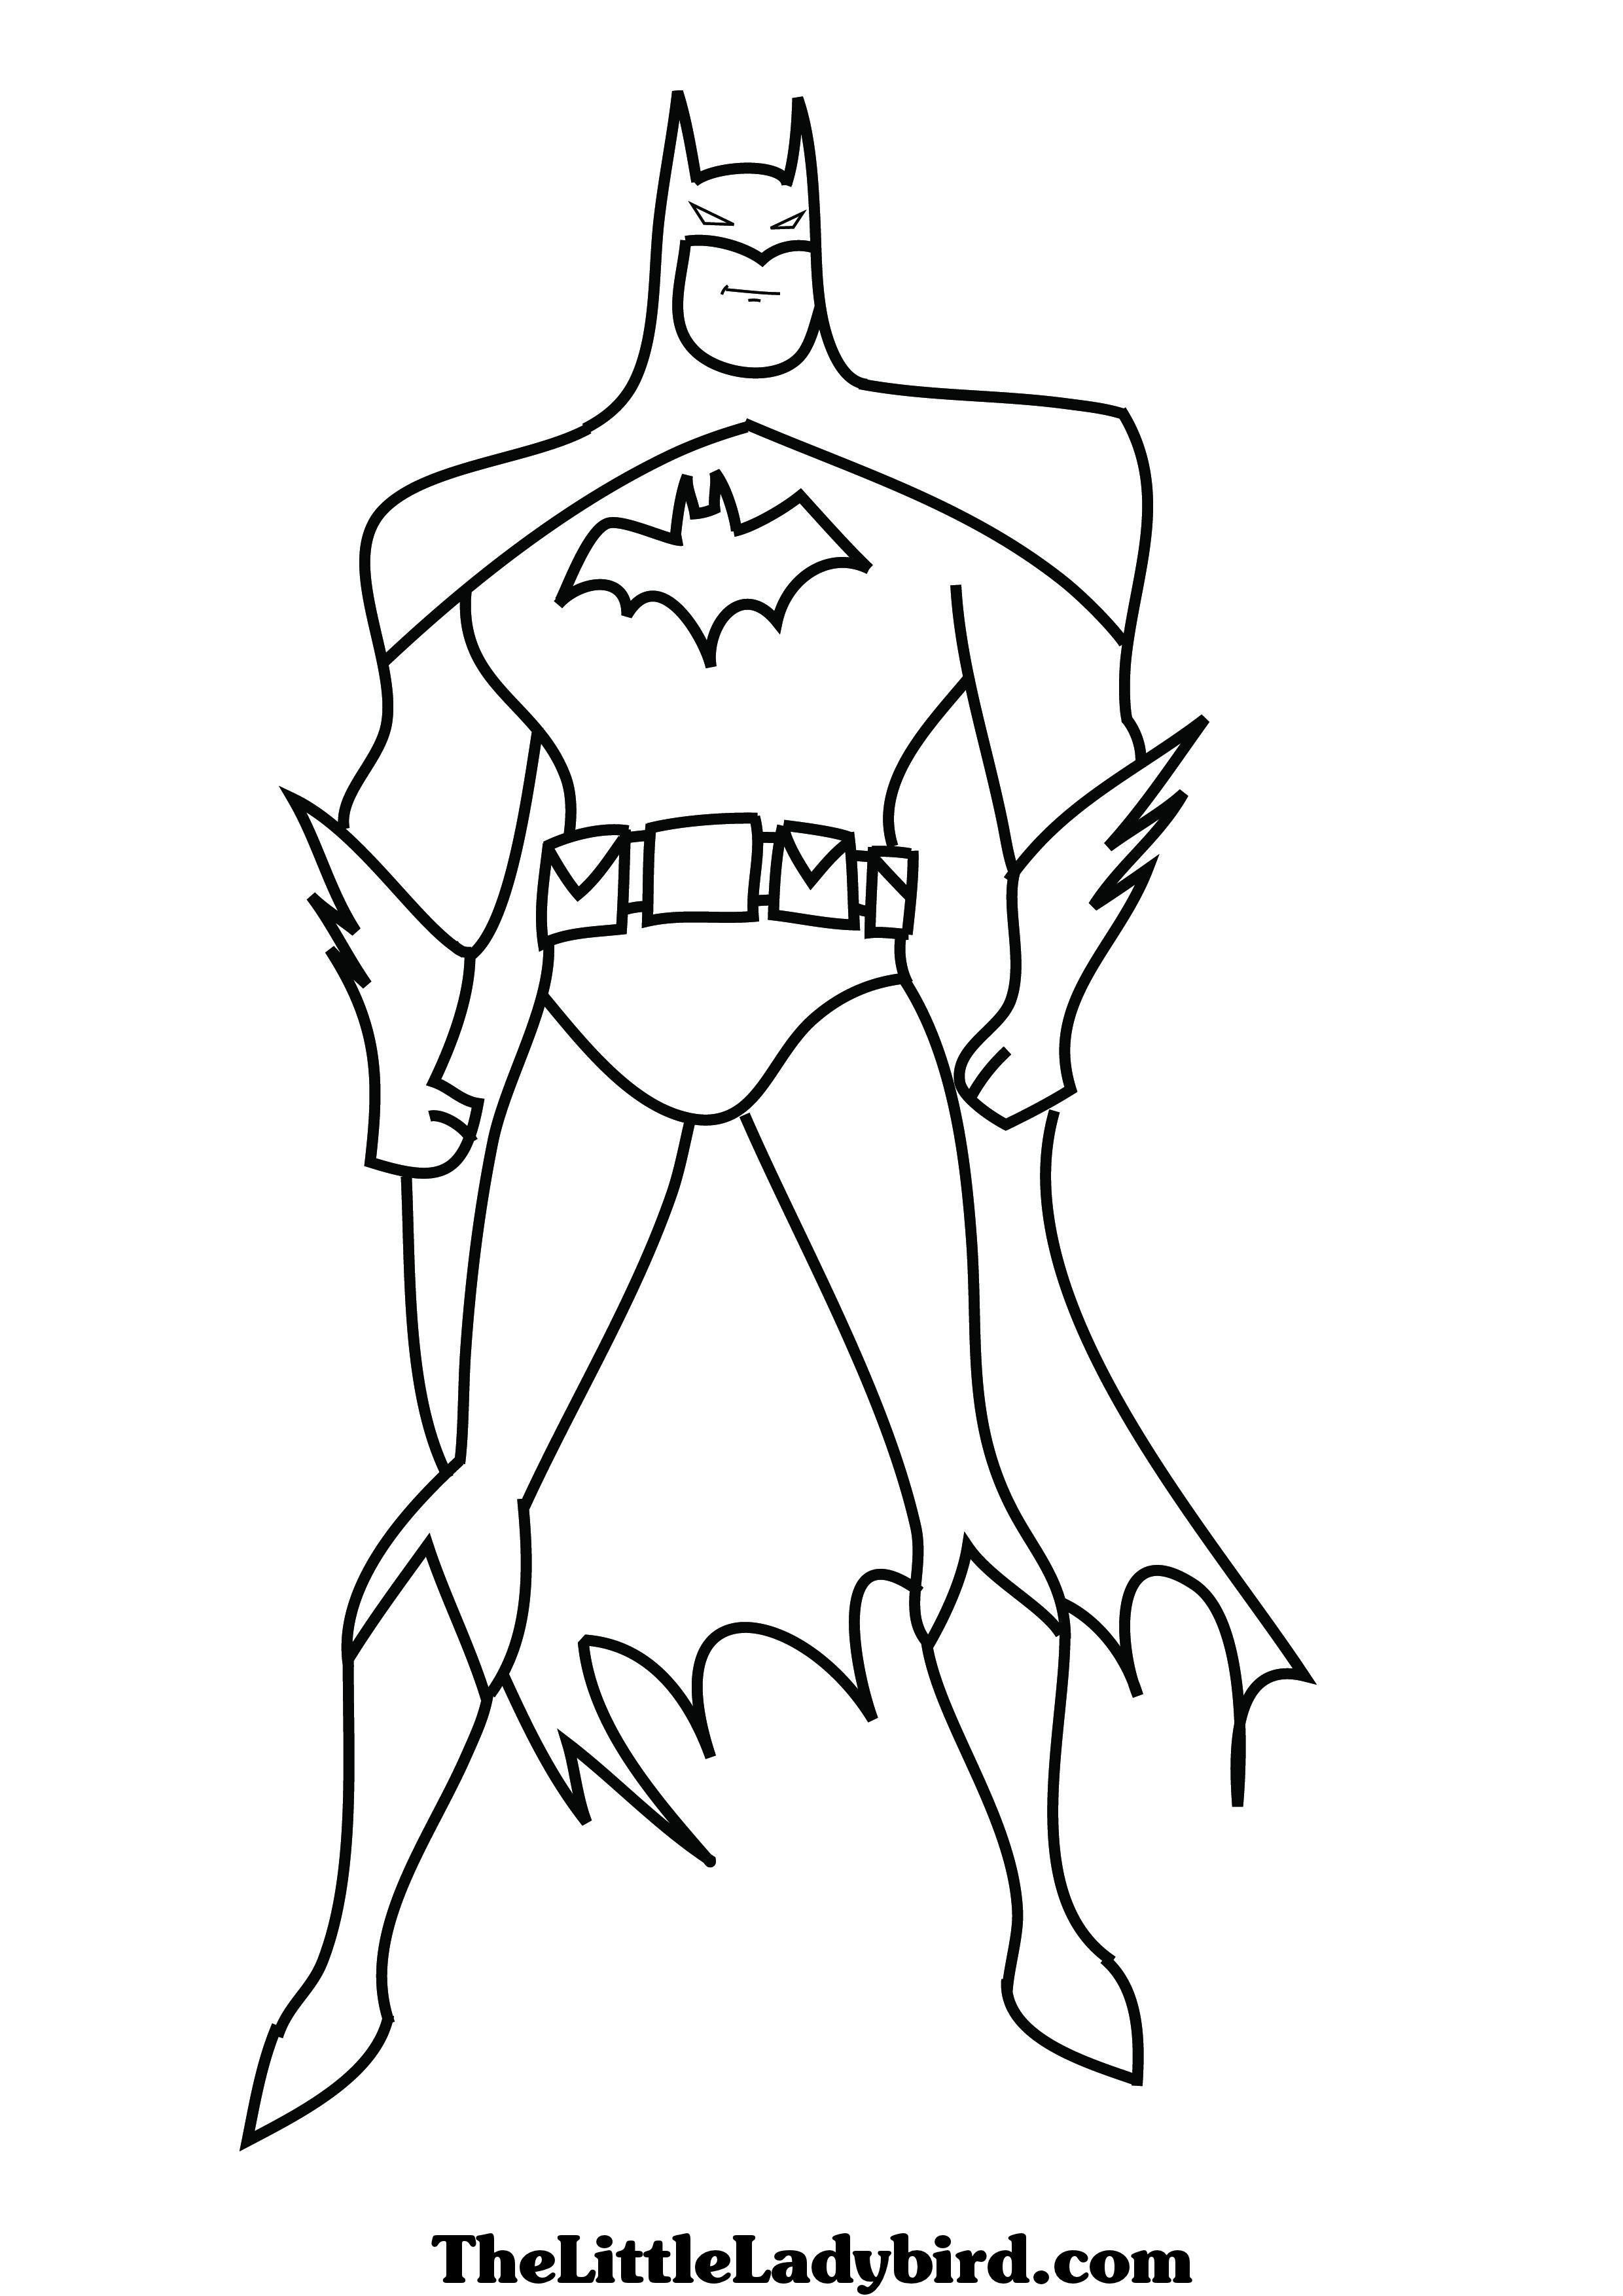 Justice League Coloring Pages Luxury Coloring Pages Batman